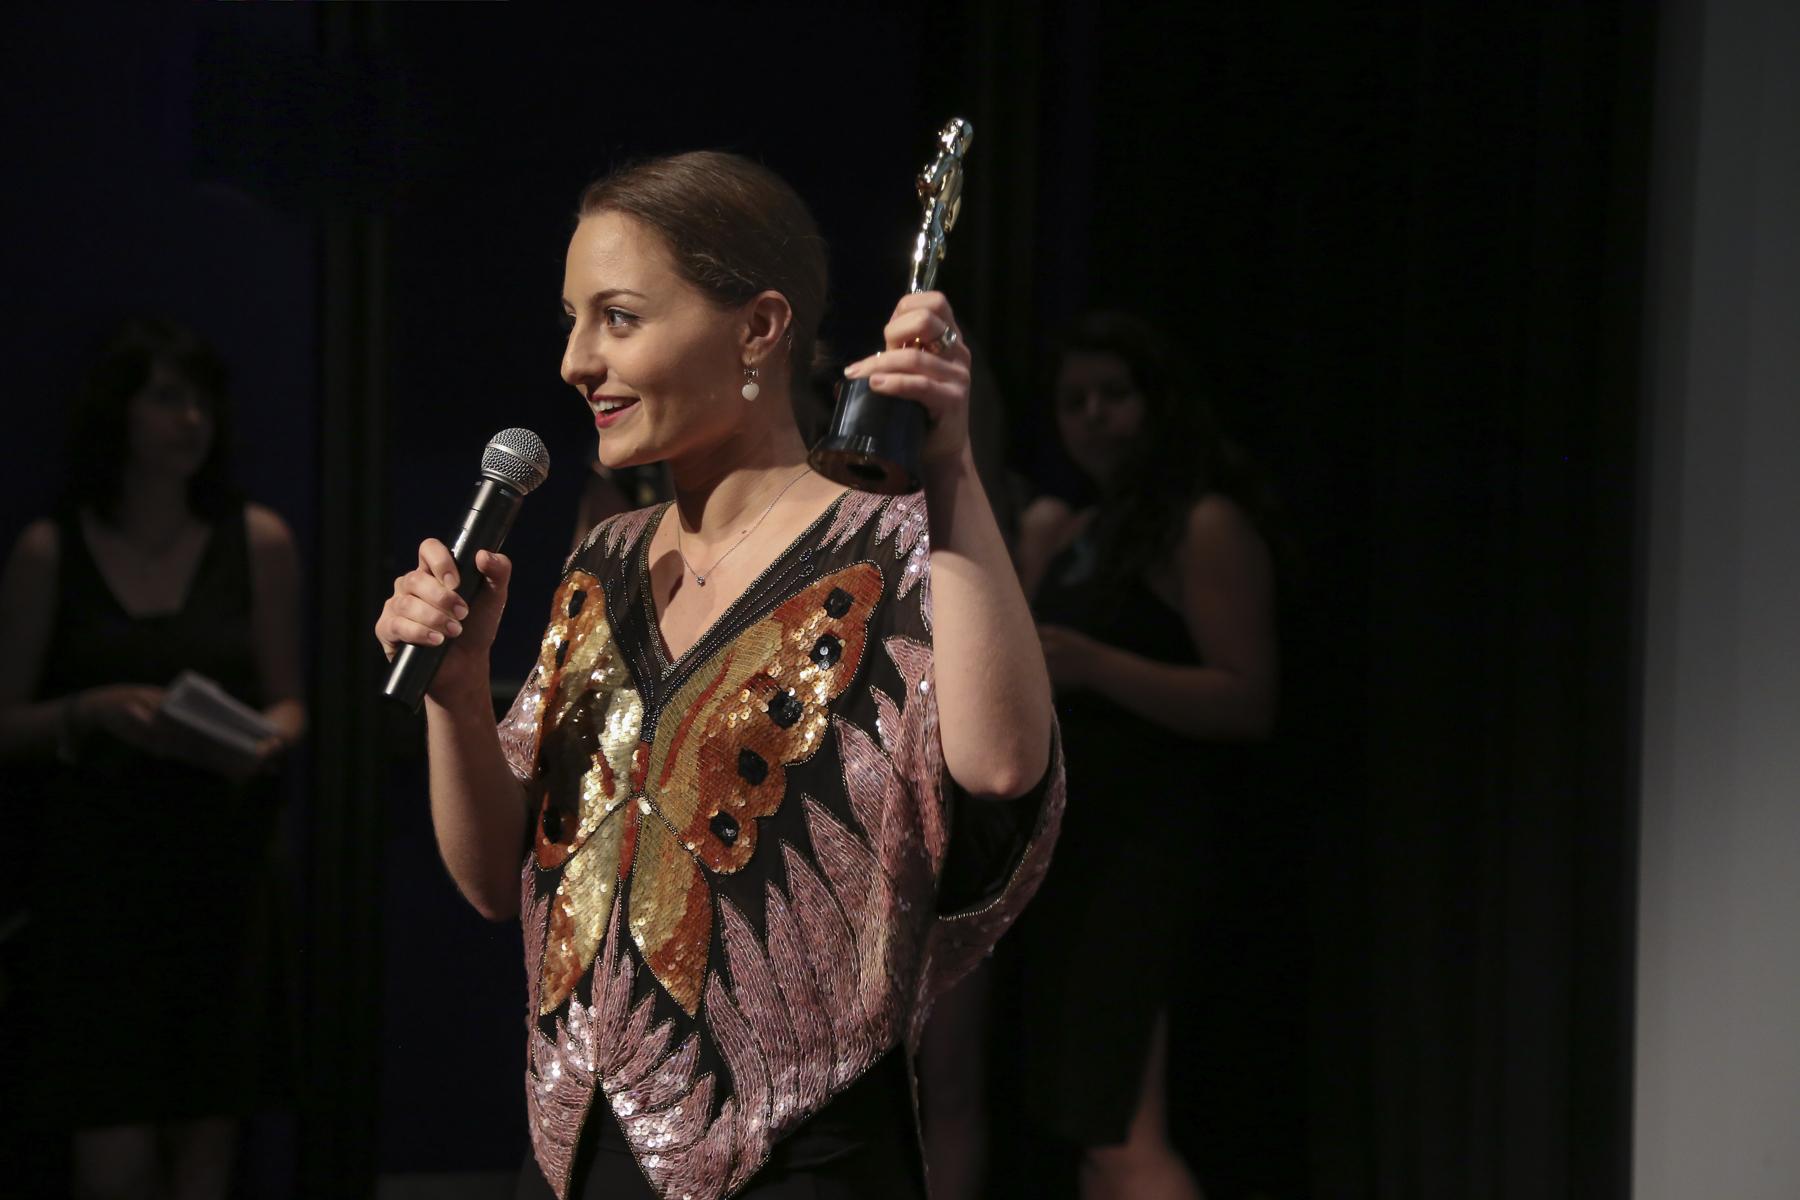 Best Lead Actress in a Short Film Award - New York City International Film Festival 2014